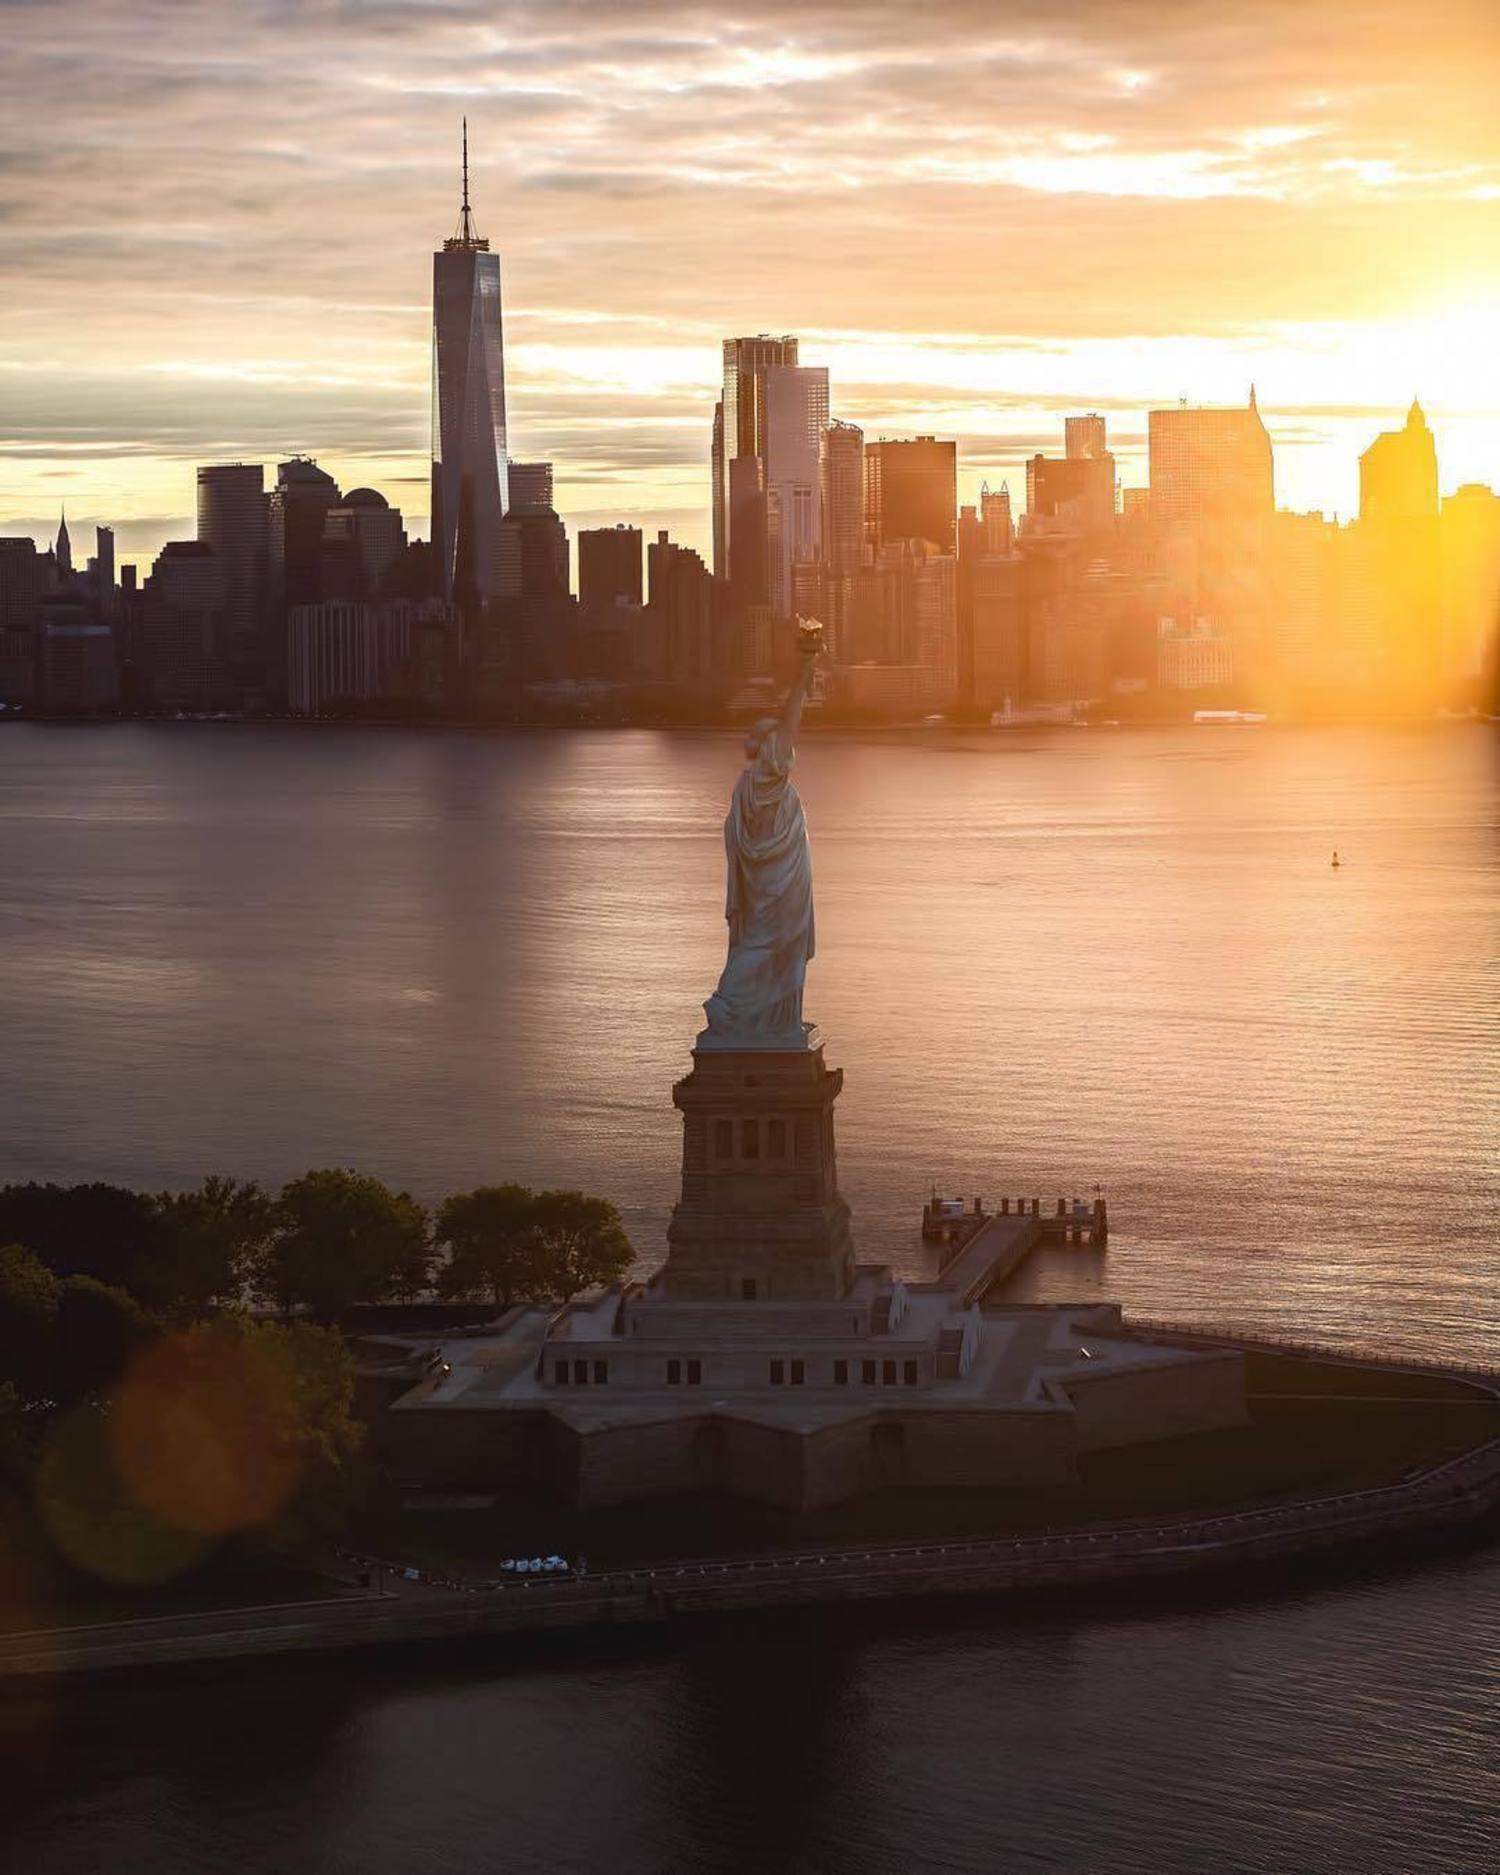 New York, New York. Photo via @flynyon #viewingnyc #newyork #newyorkcity #nyc #sunrise #statueofliberty